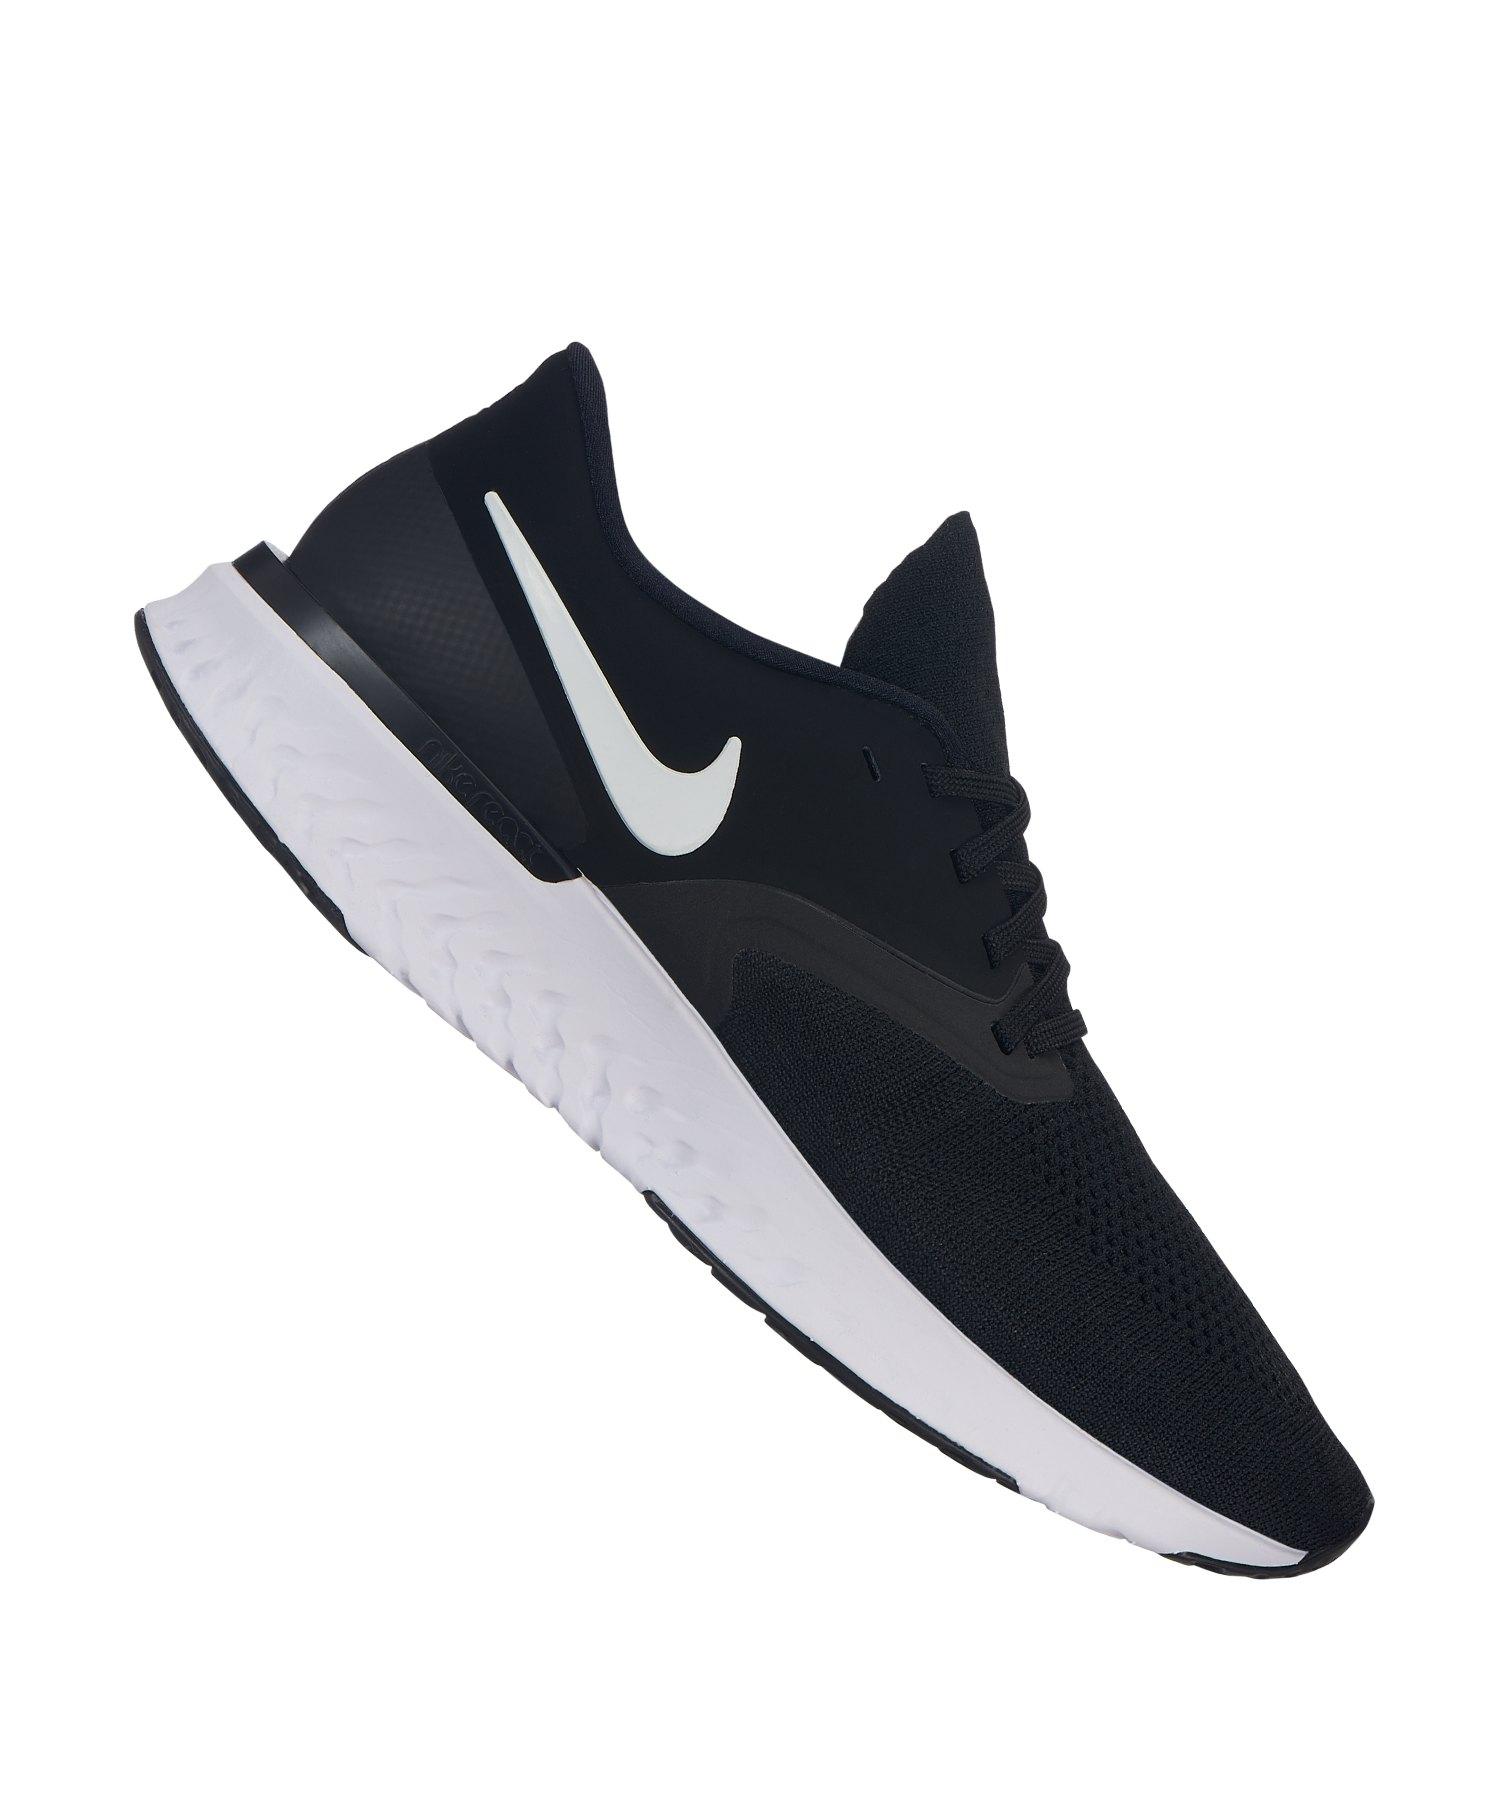 Nike Odyssey React Flyknit 2 Running Schwarz F010 - schwarz